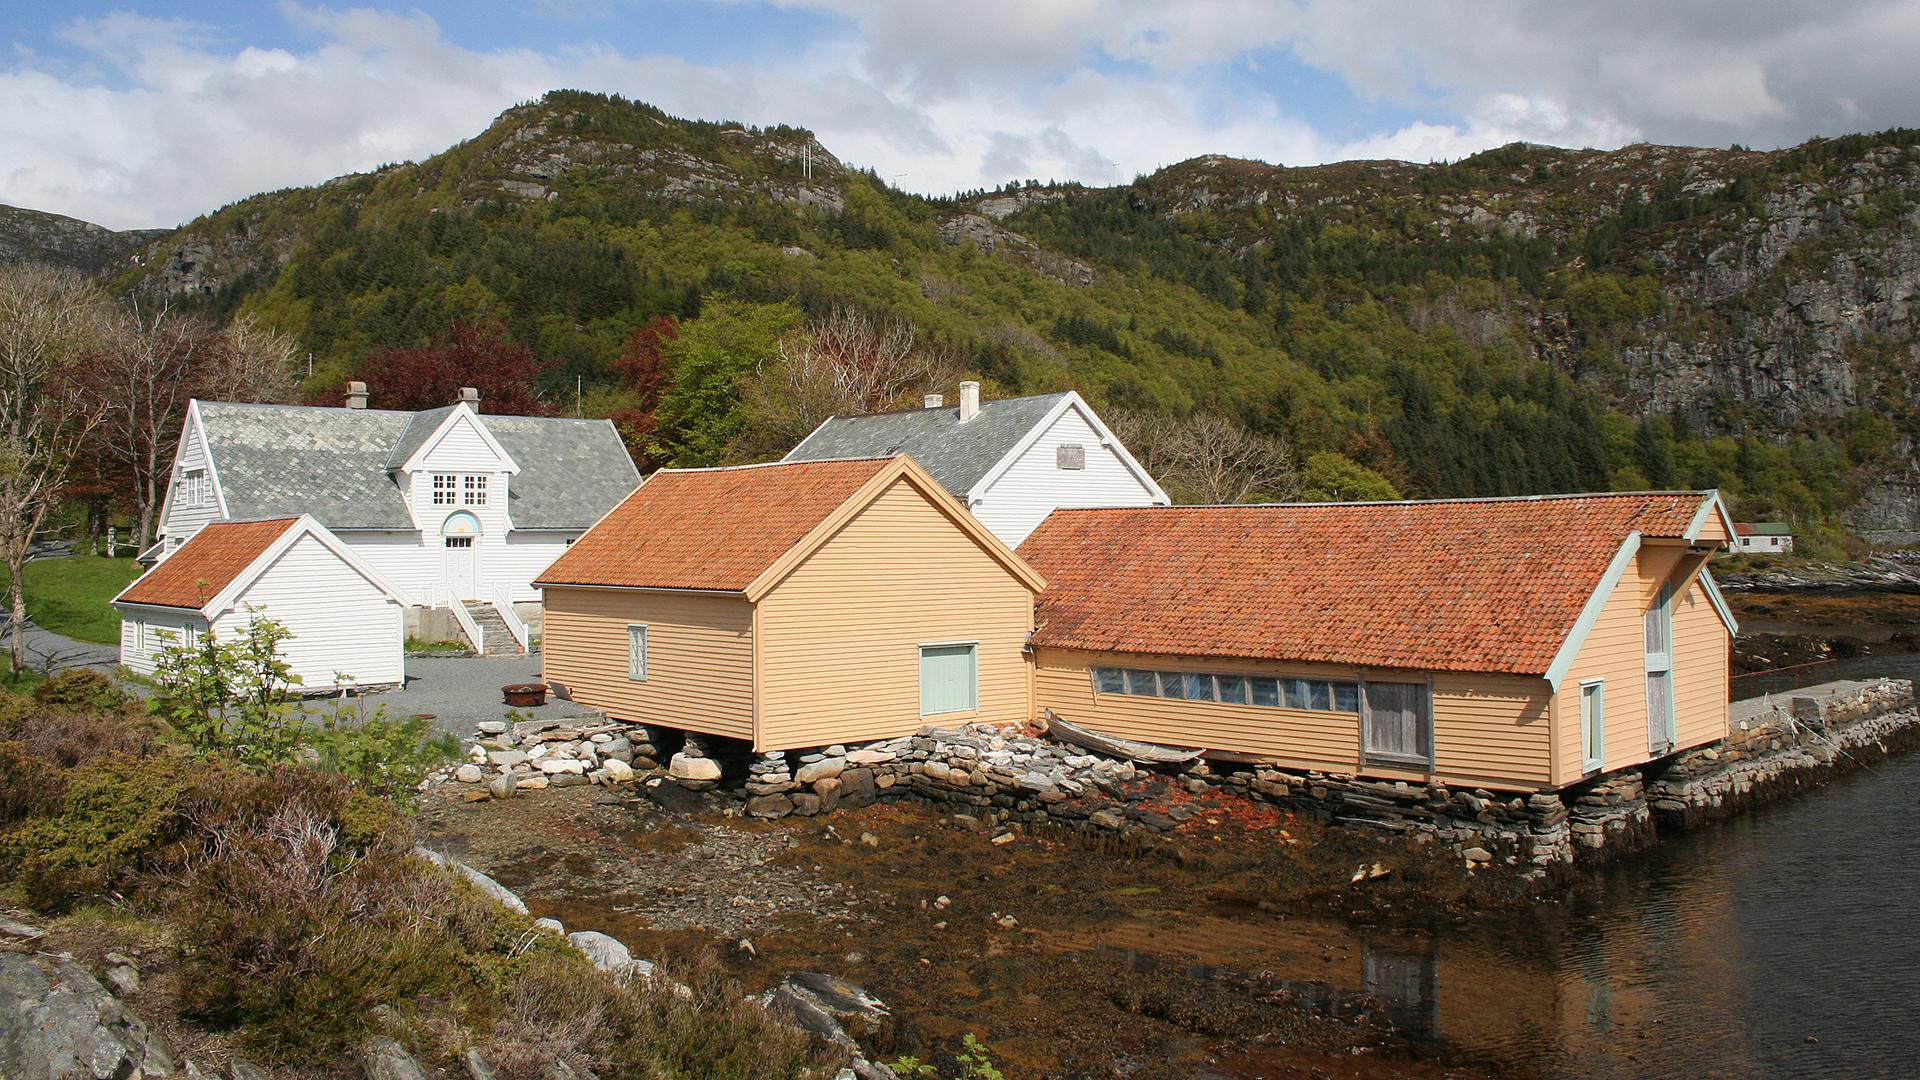 Vågsberget i Vågsøy Sogn og Fjordane. Foto: Geir Olav Gram Riksantikvaren